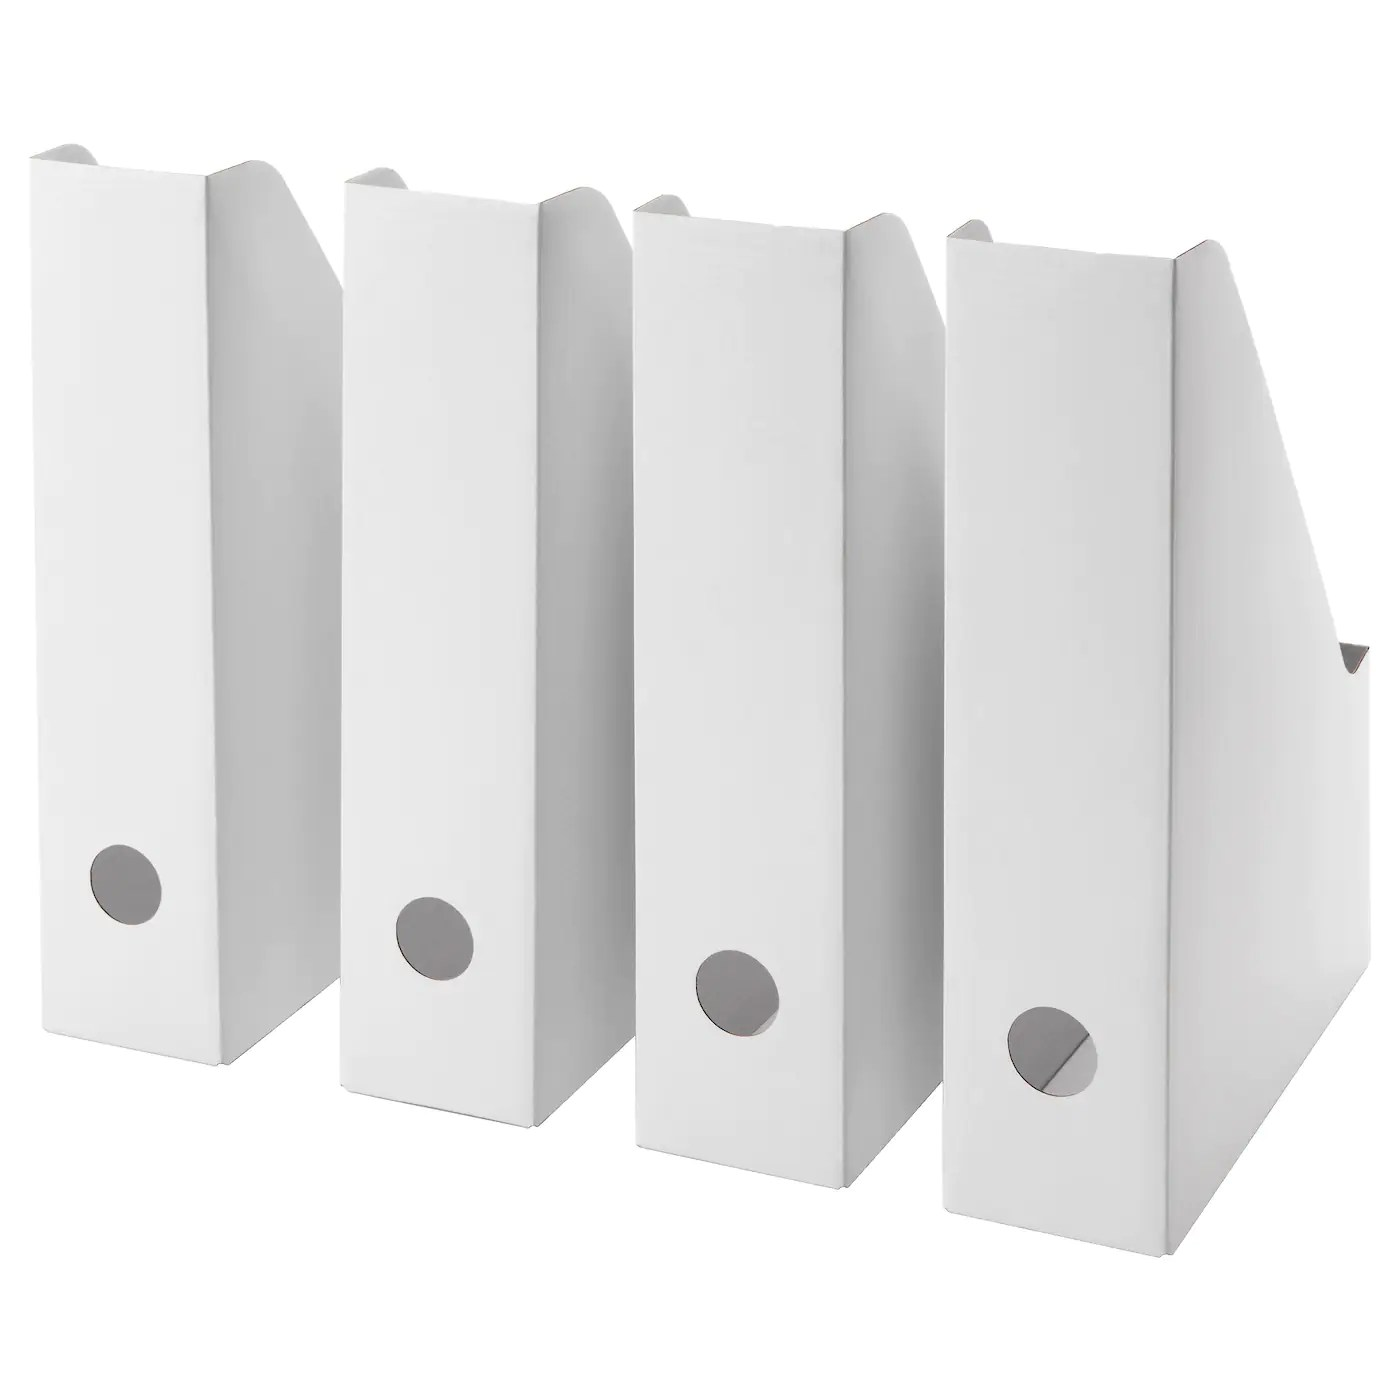 Fluns Range Revues Blanc Materiau Durable Ikea